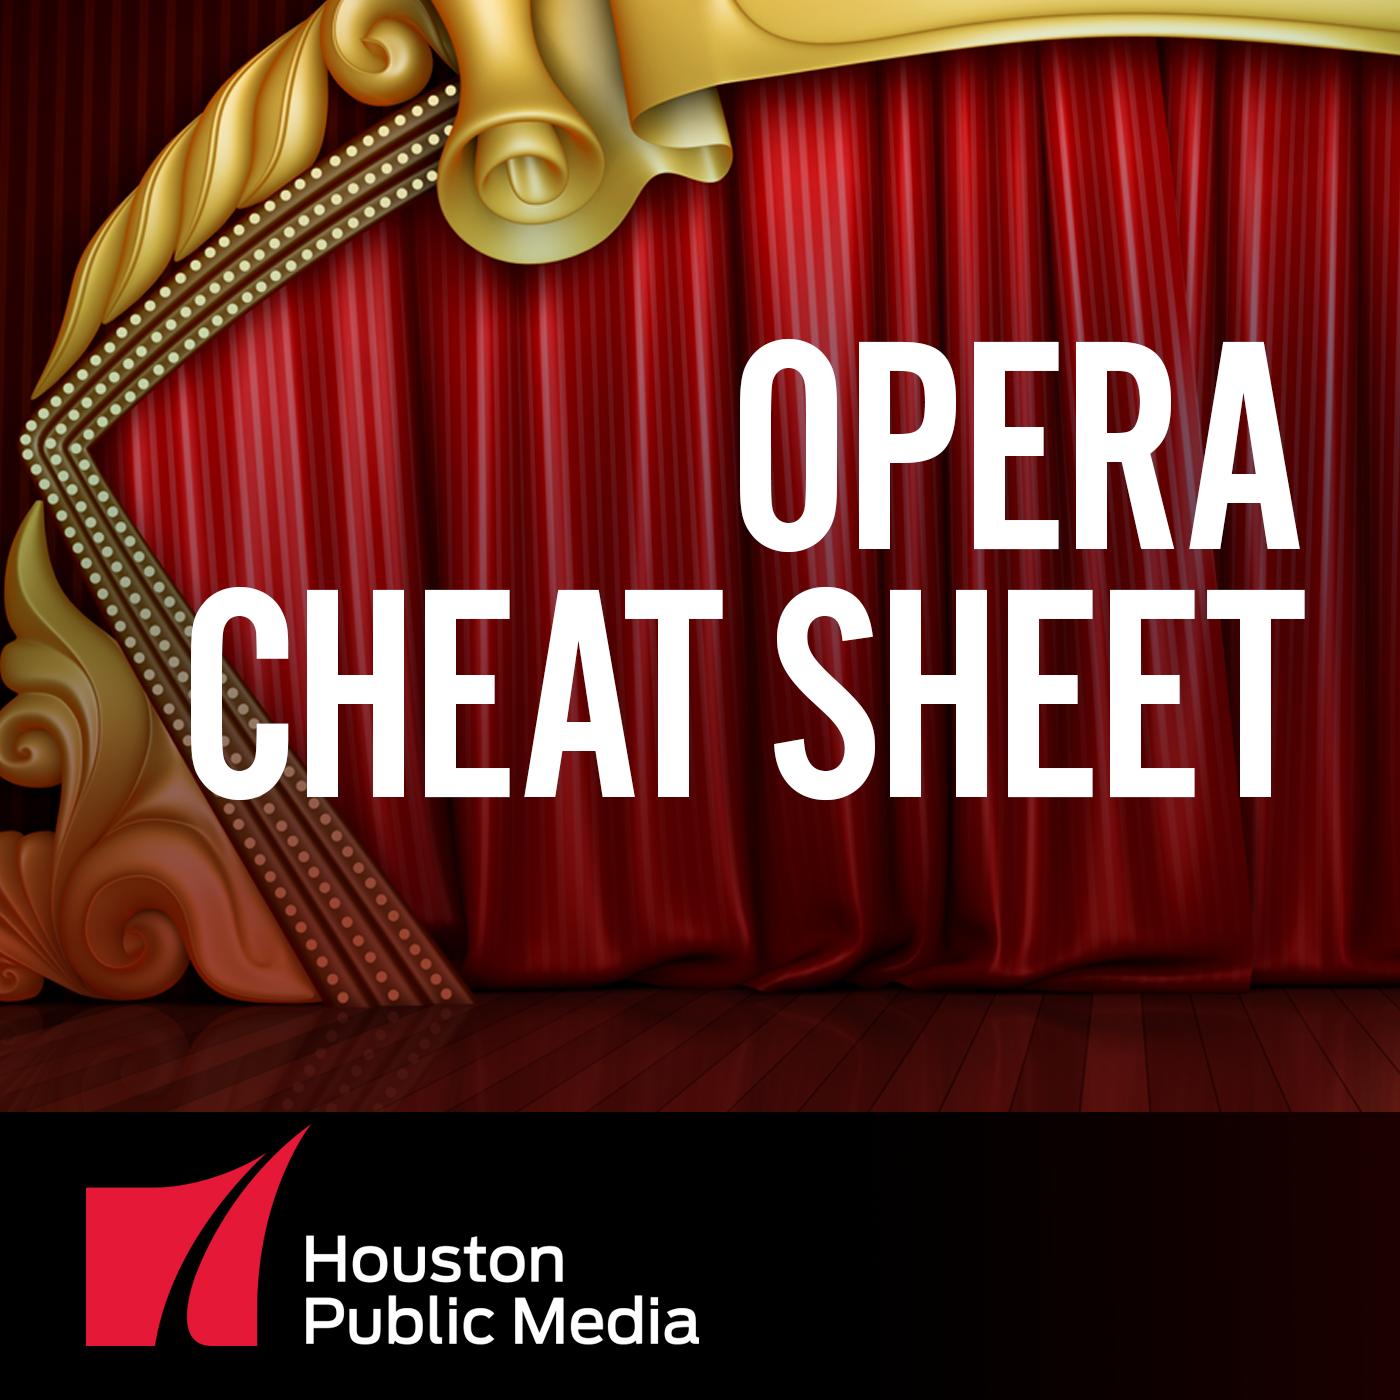 Opera Cheat Sheet | Houston Public Media